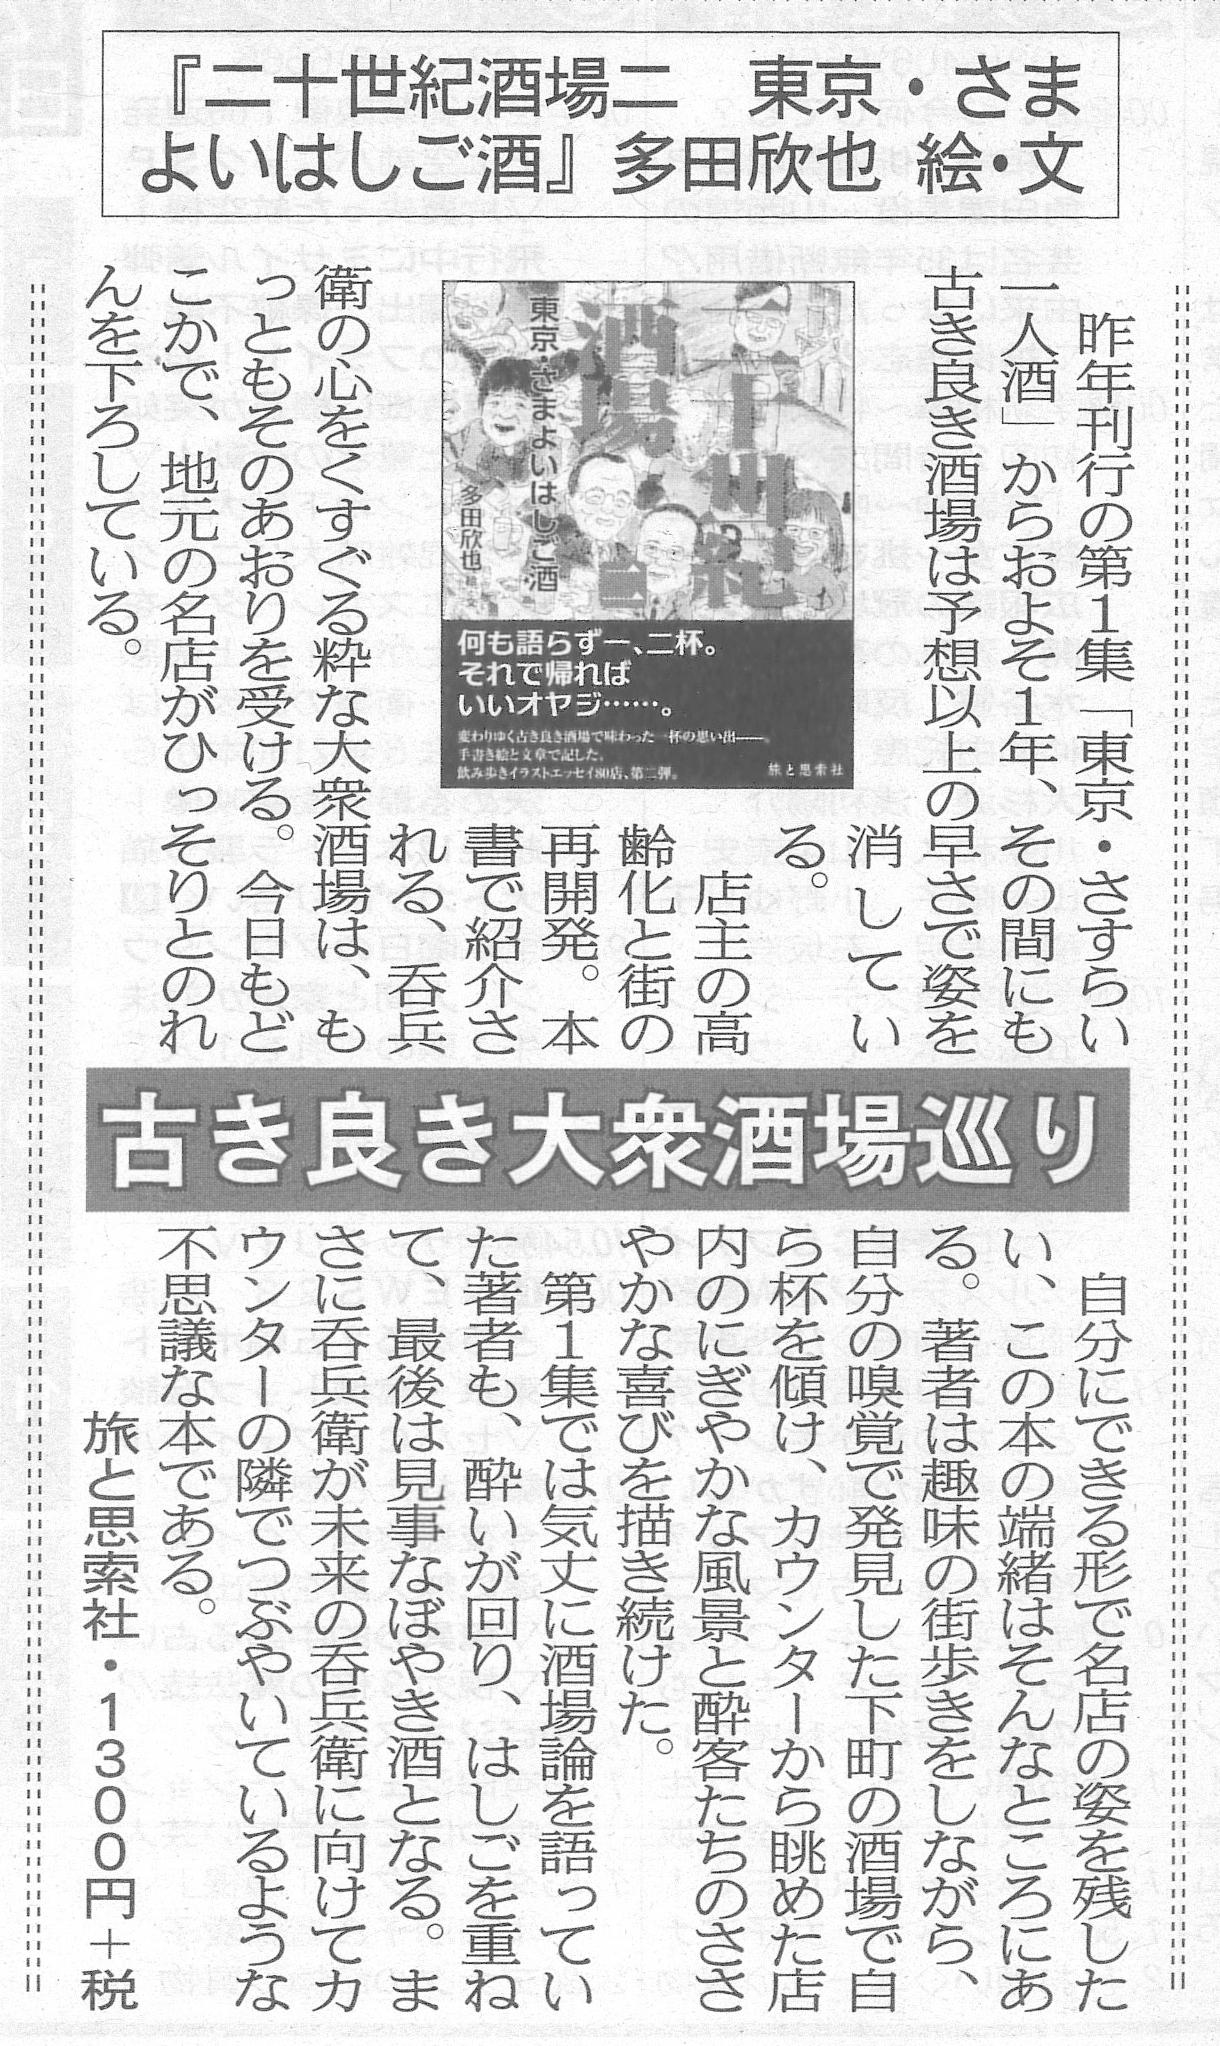 yukanfuji_161012_001